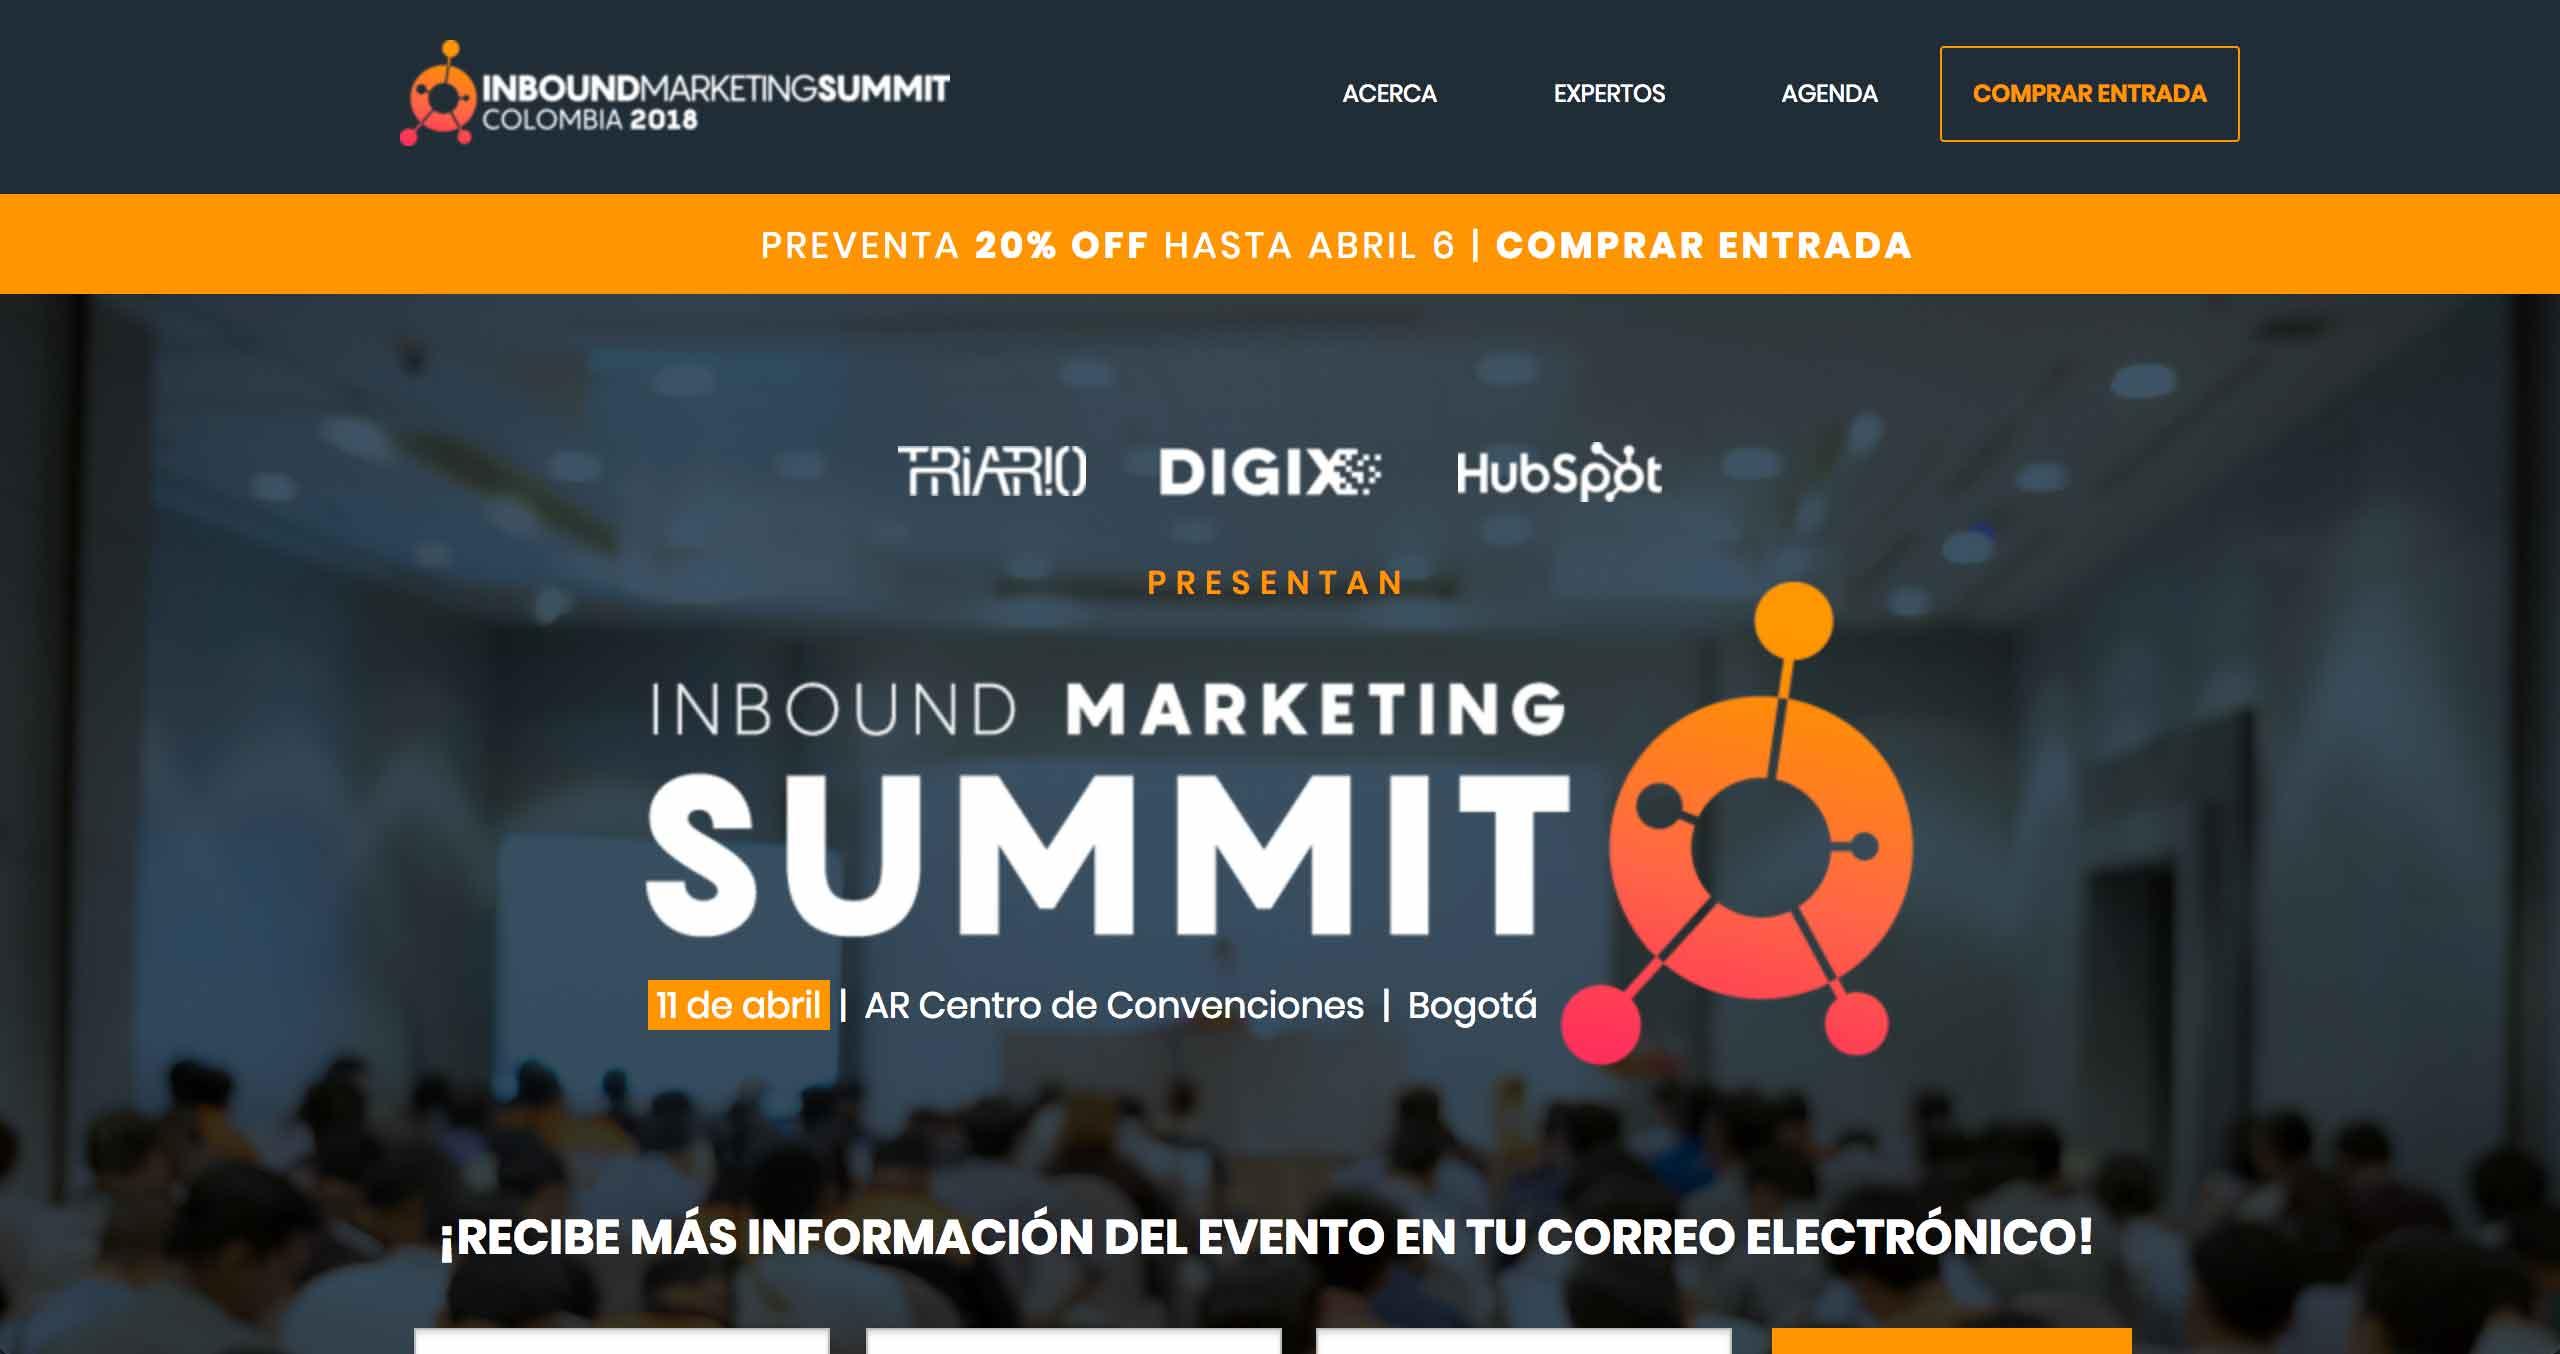 landing page evento marketing inbound marketing summit colombia 2018